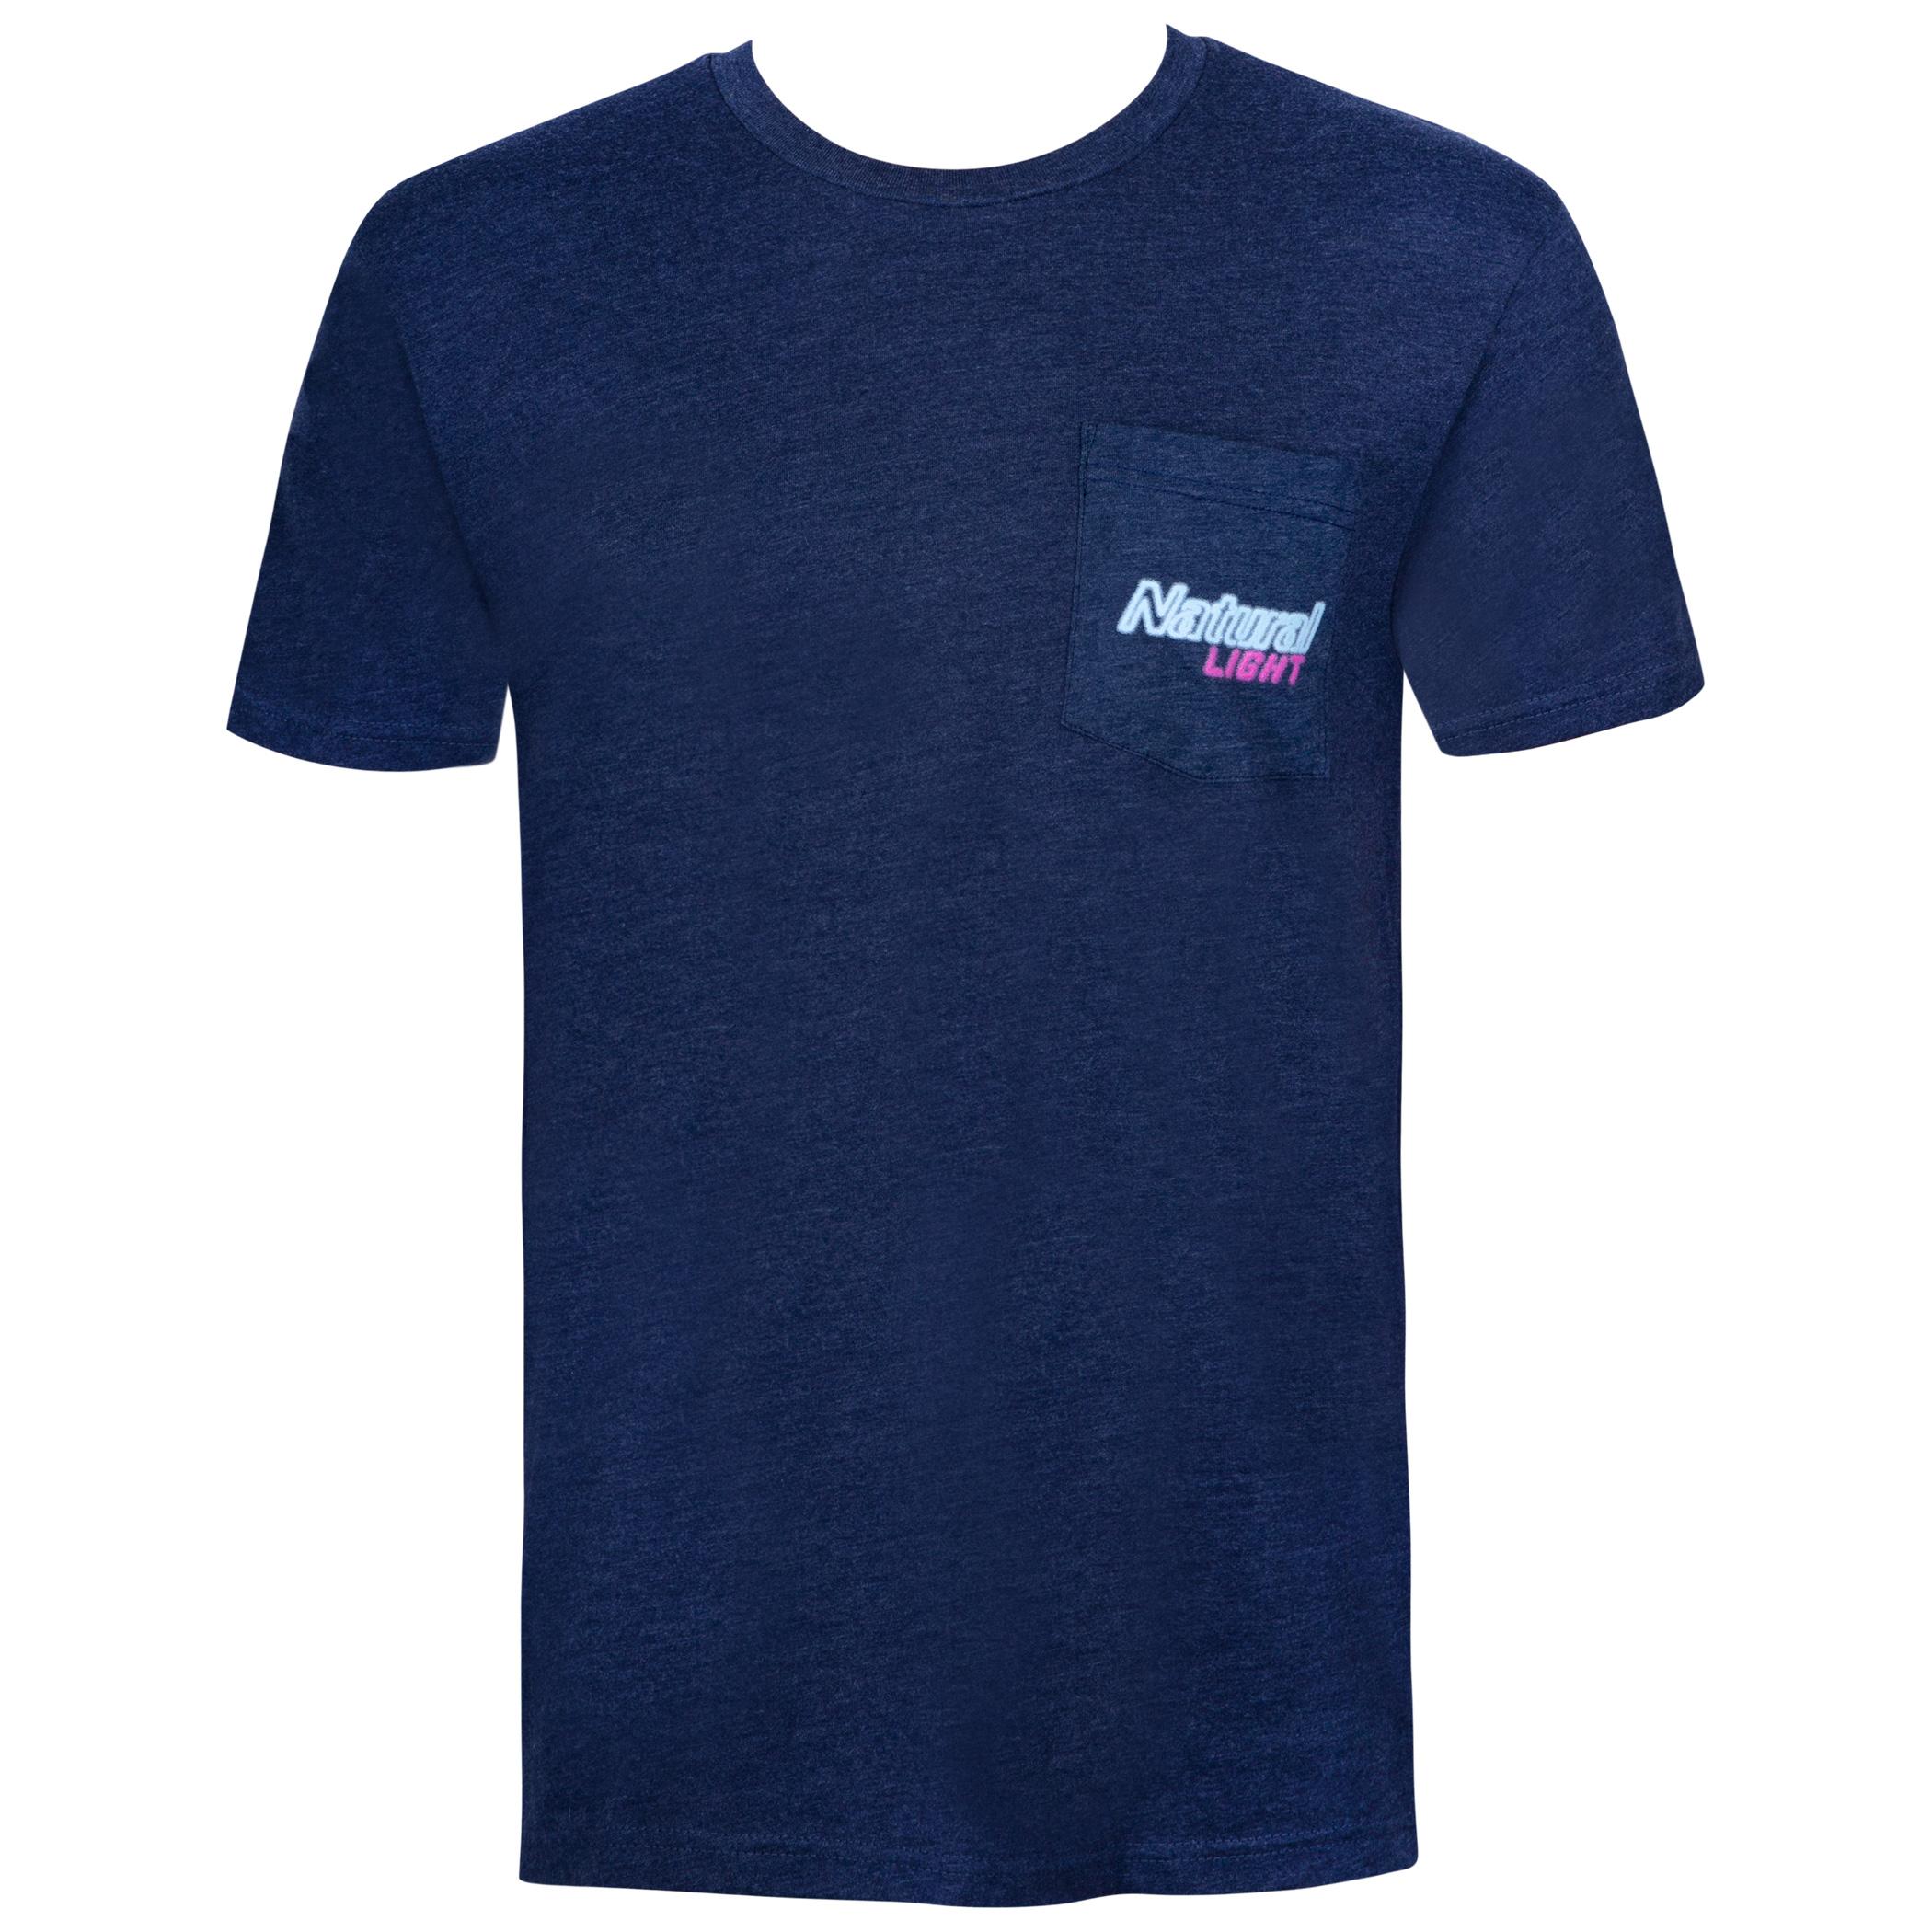 Natural Light Men's Navy Blue Neon Sign Naturdays T-Shirt